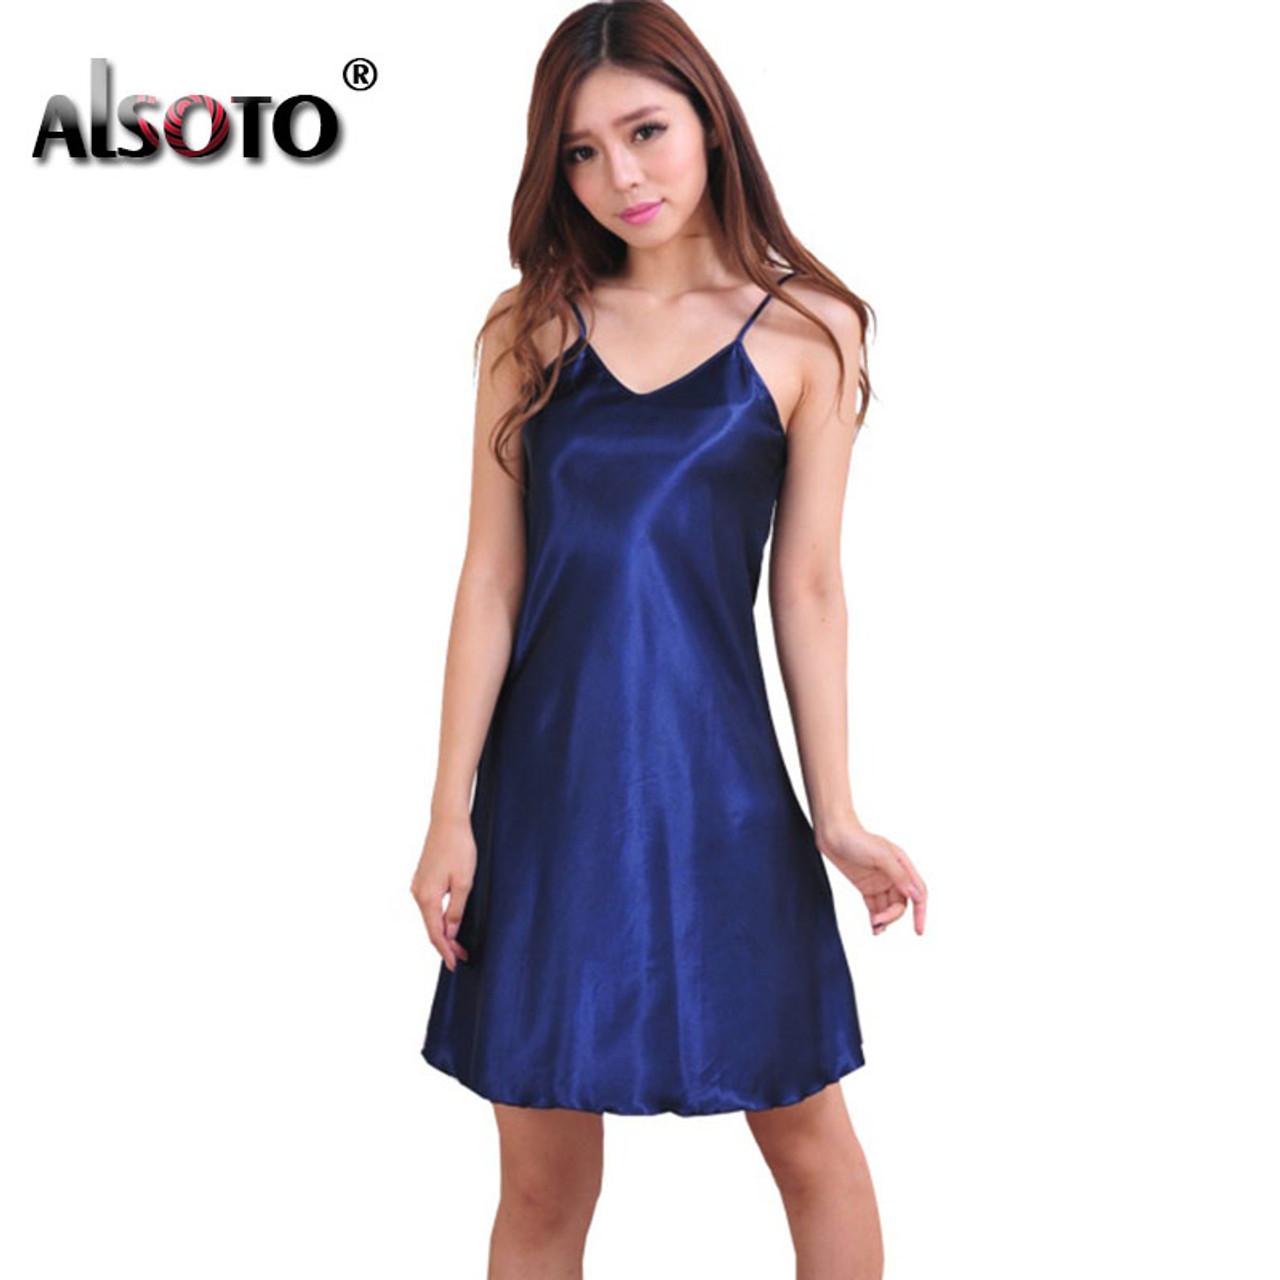 ... Ladies Sexy Silk Satin Night Dress Sleeveless Nighties V-neck Nightwear  For Women Nightgown Plus ... 2cfe501158